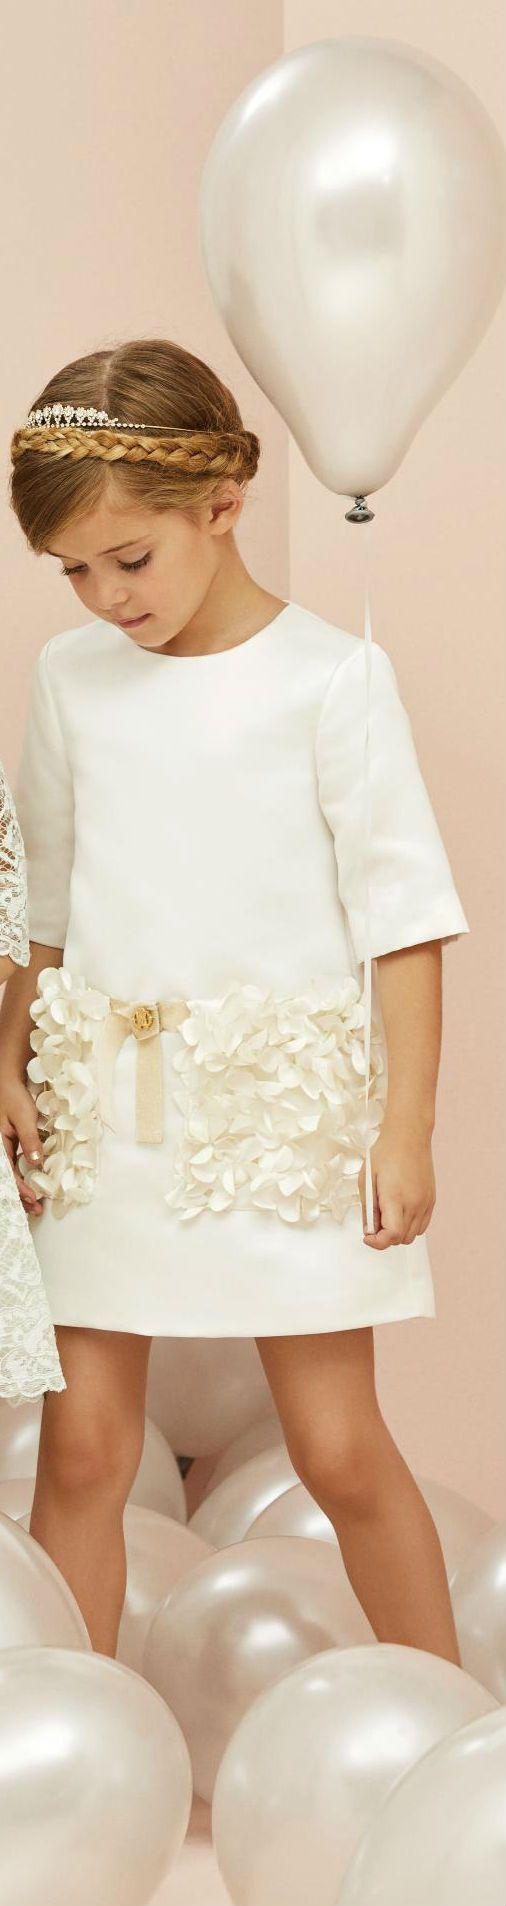 996087d59a98 Roberto Cavalli Junior Girls Cream Floral Embellished Dress Spring Summer  2018.  robertocavalli  kidsfashion  kids  girl  pretty  summer  fashion   style